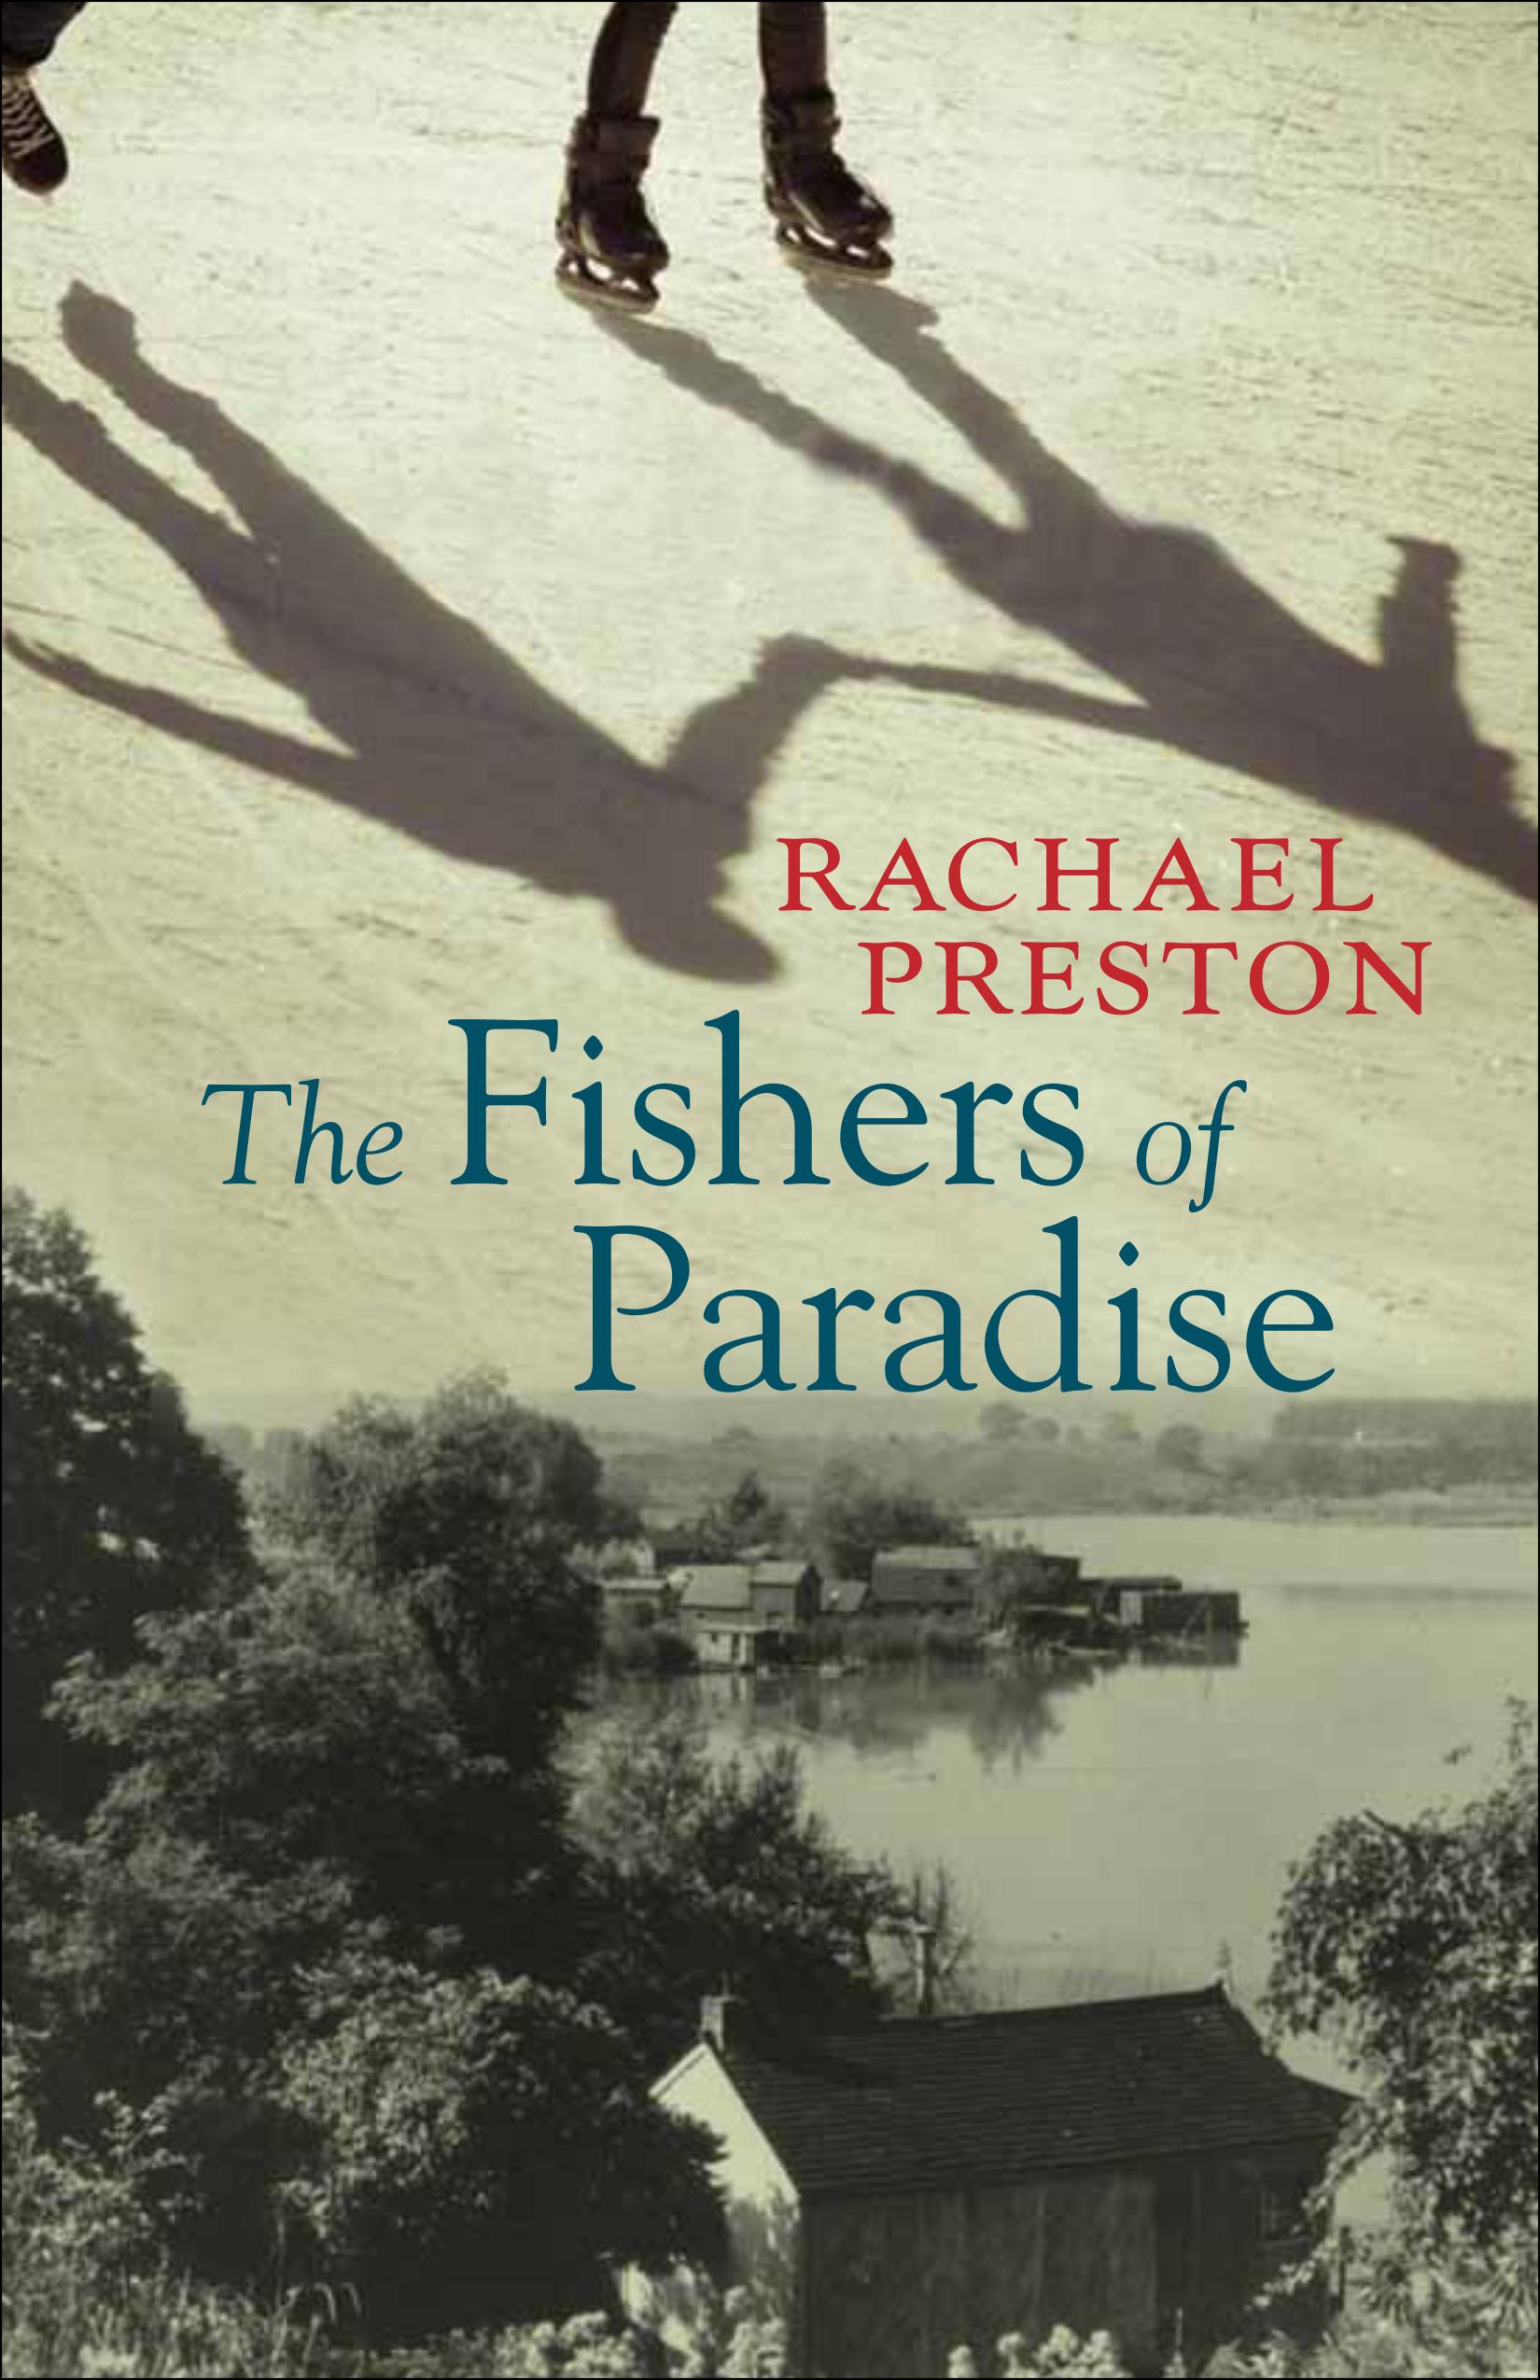 Fishers-of-Paradise.jpg